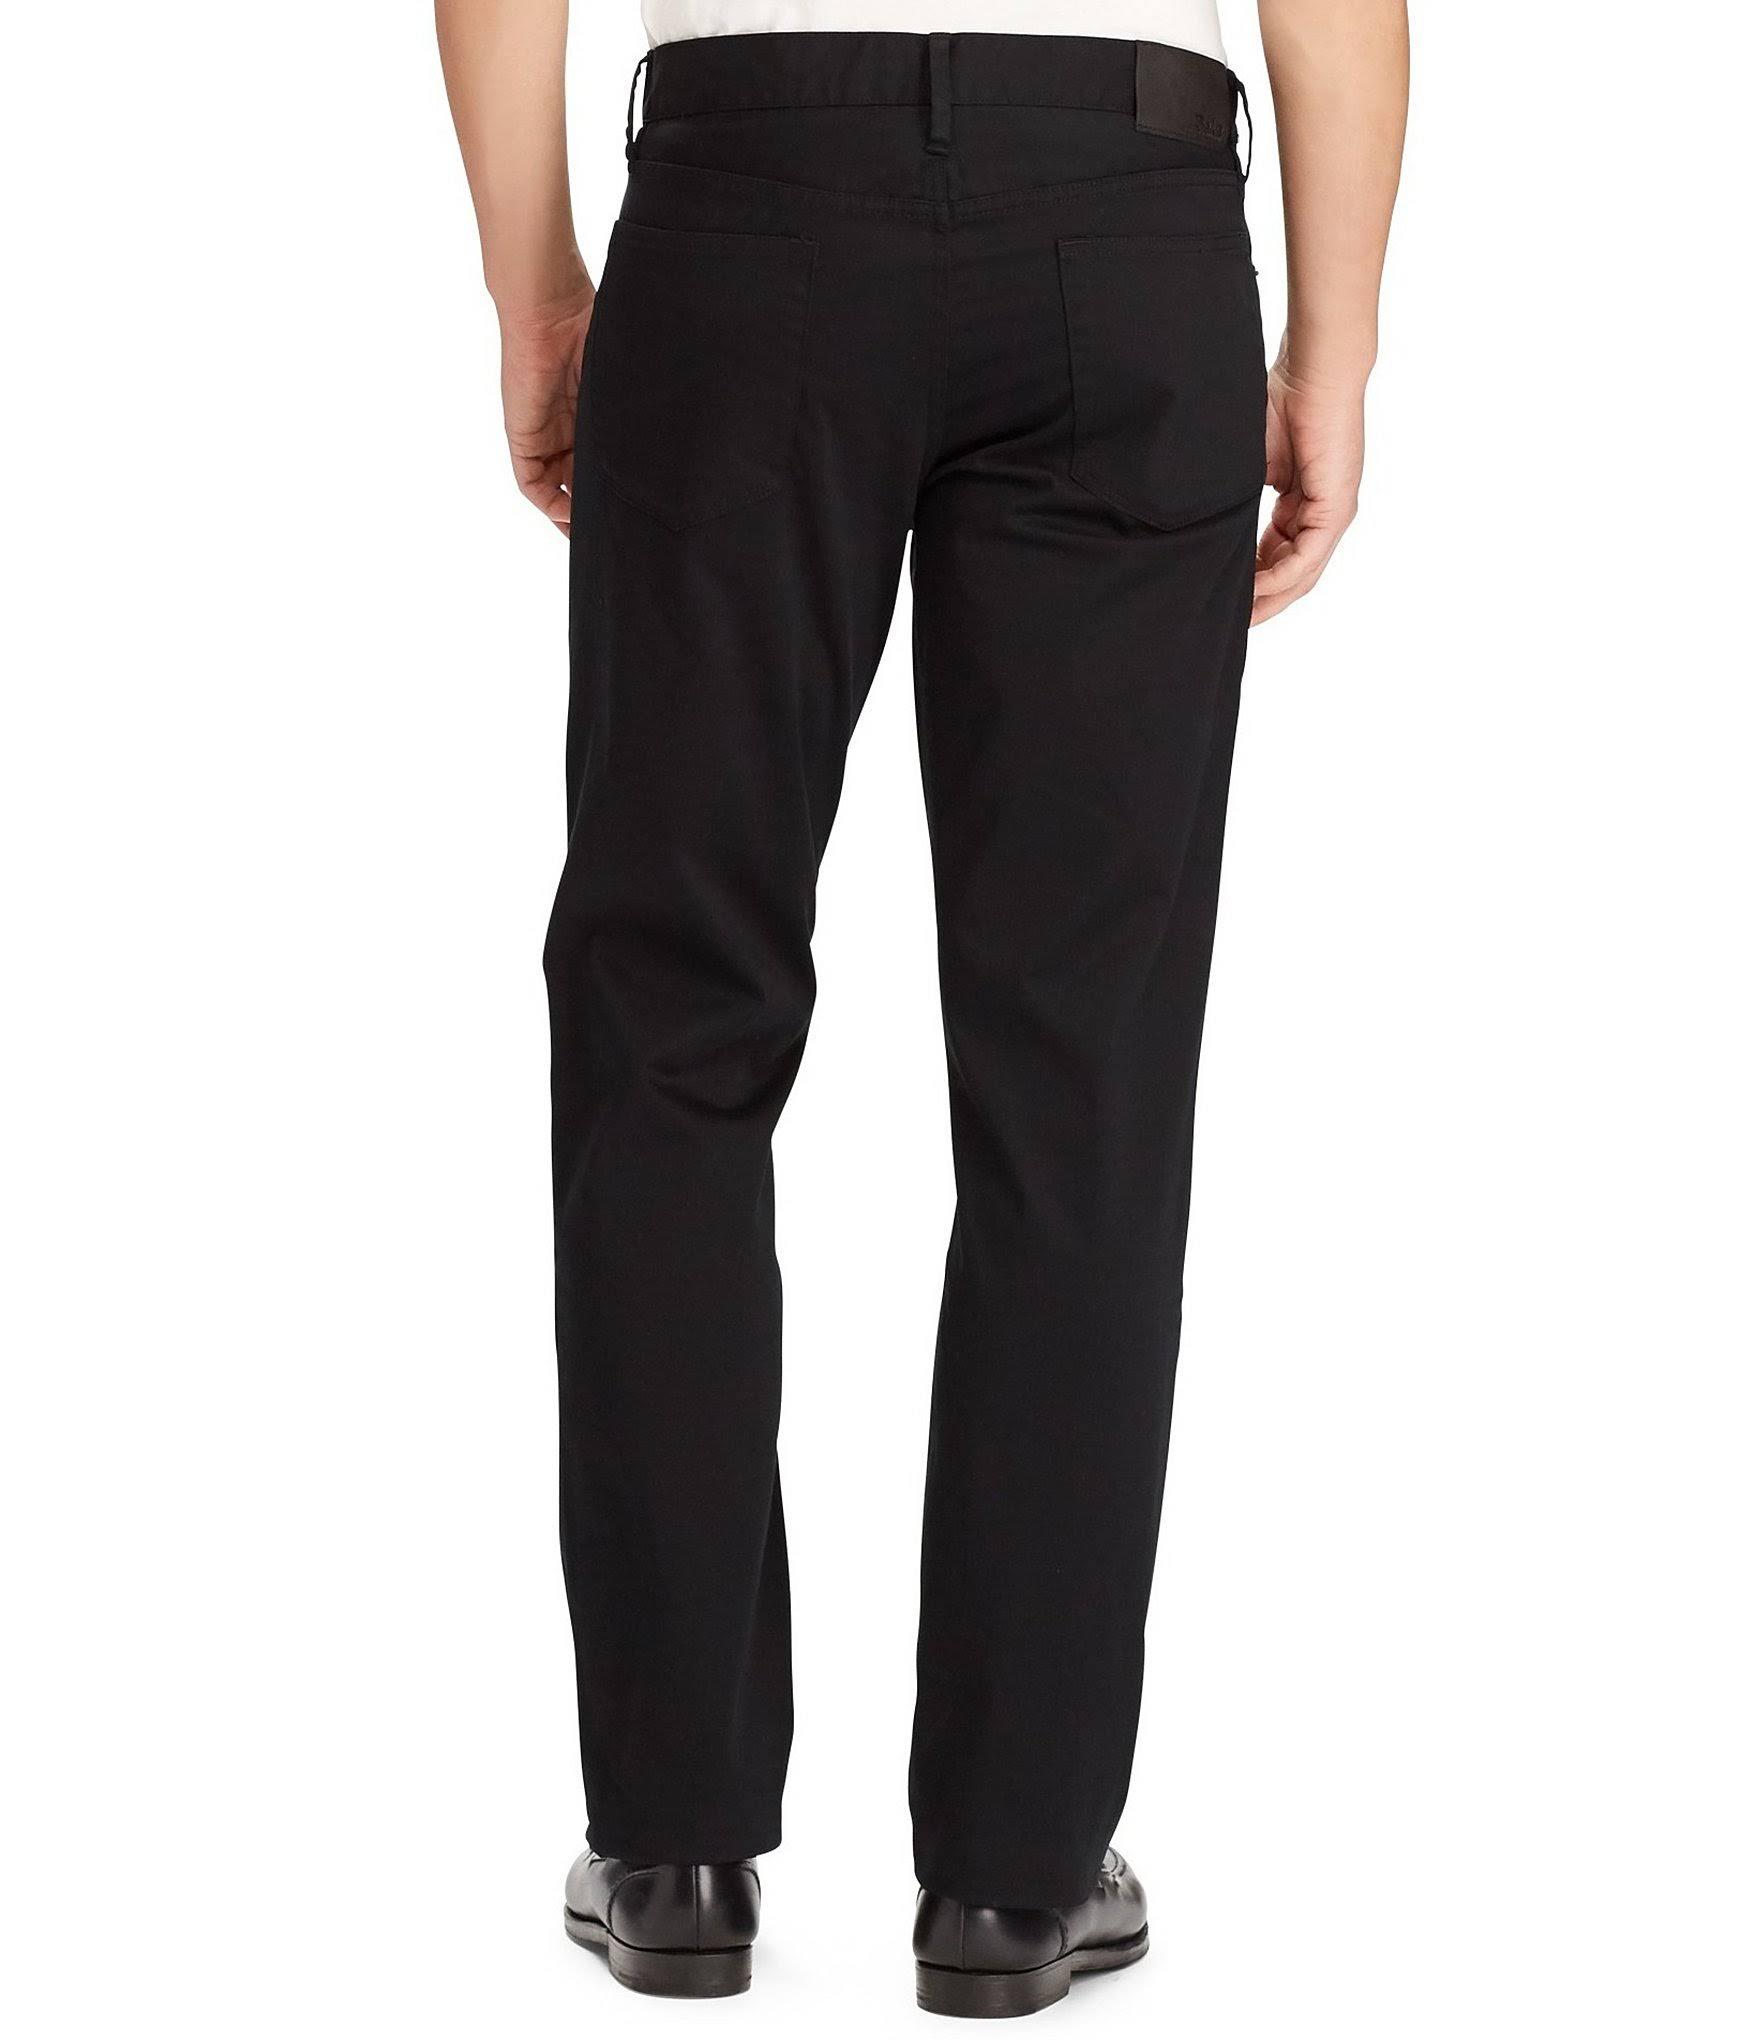 Schwarz Prospect Herren Lauren Ralph Straight Jeans 34 36 Stretch Hose X Polo FvUqw7n